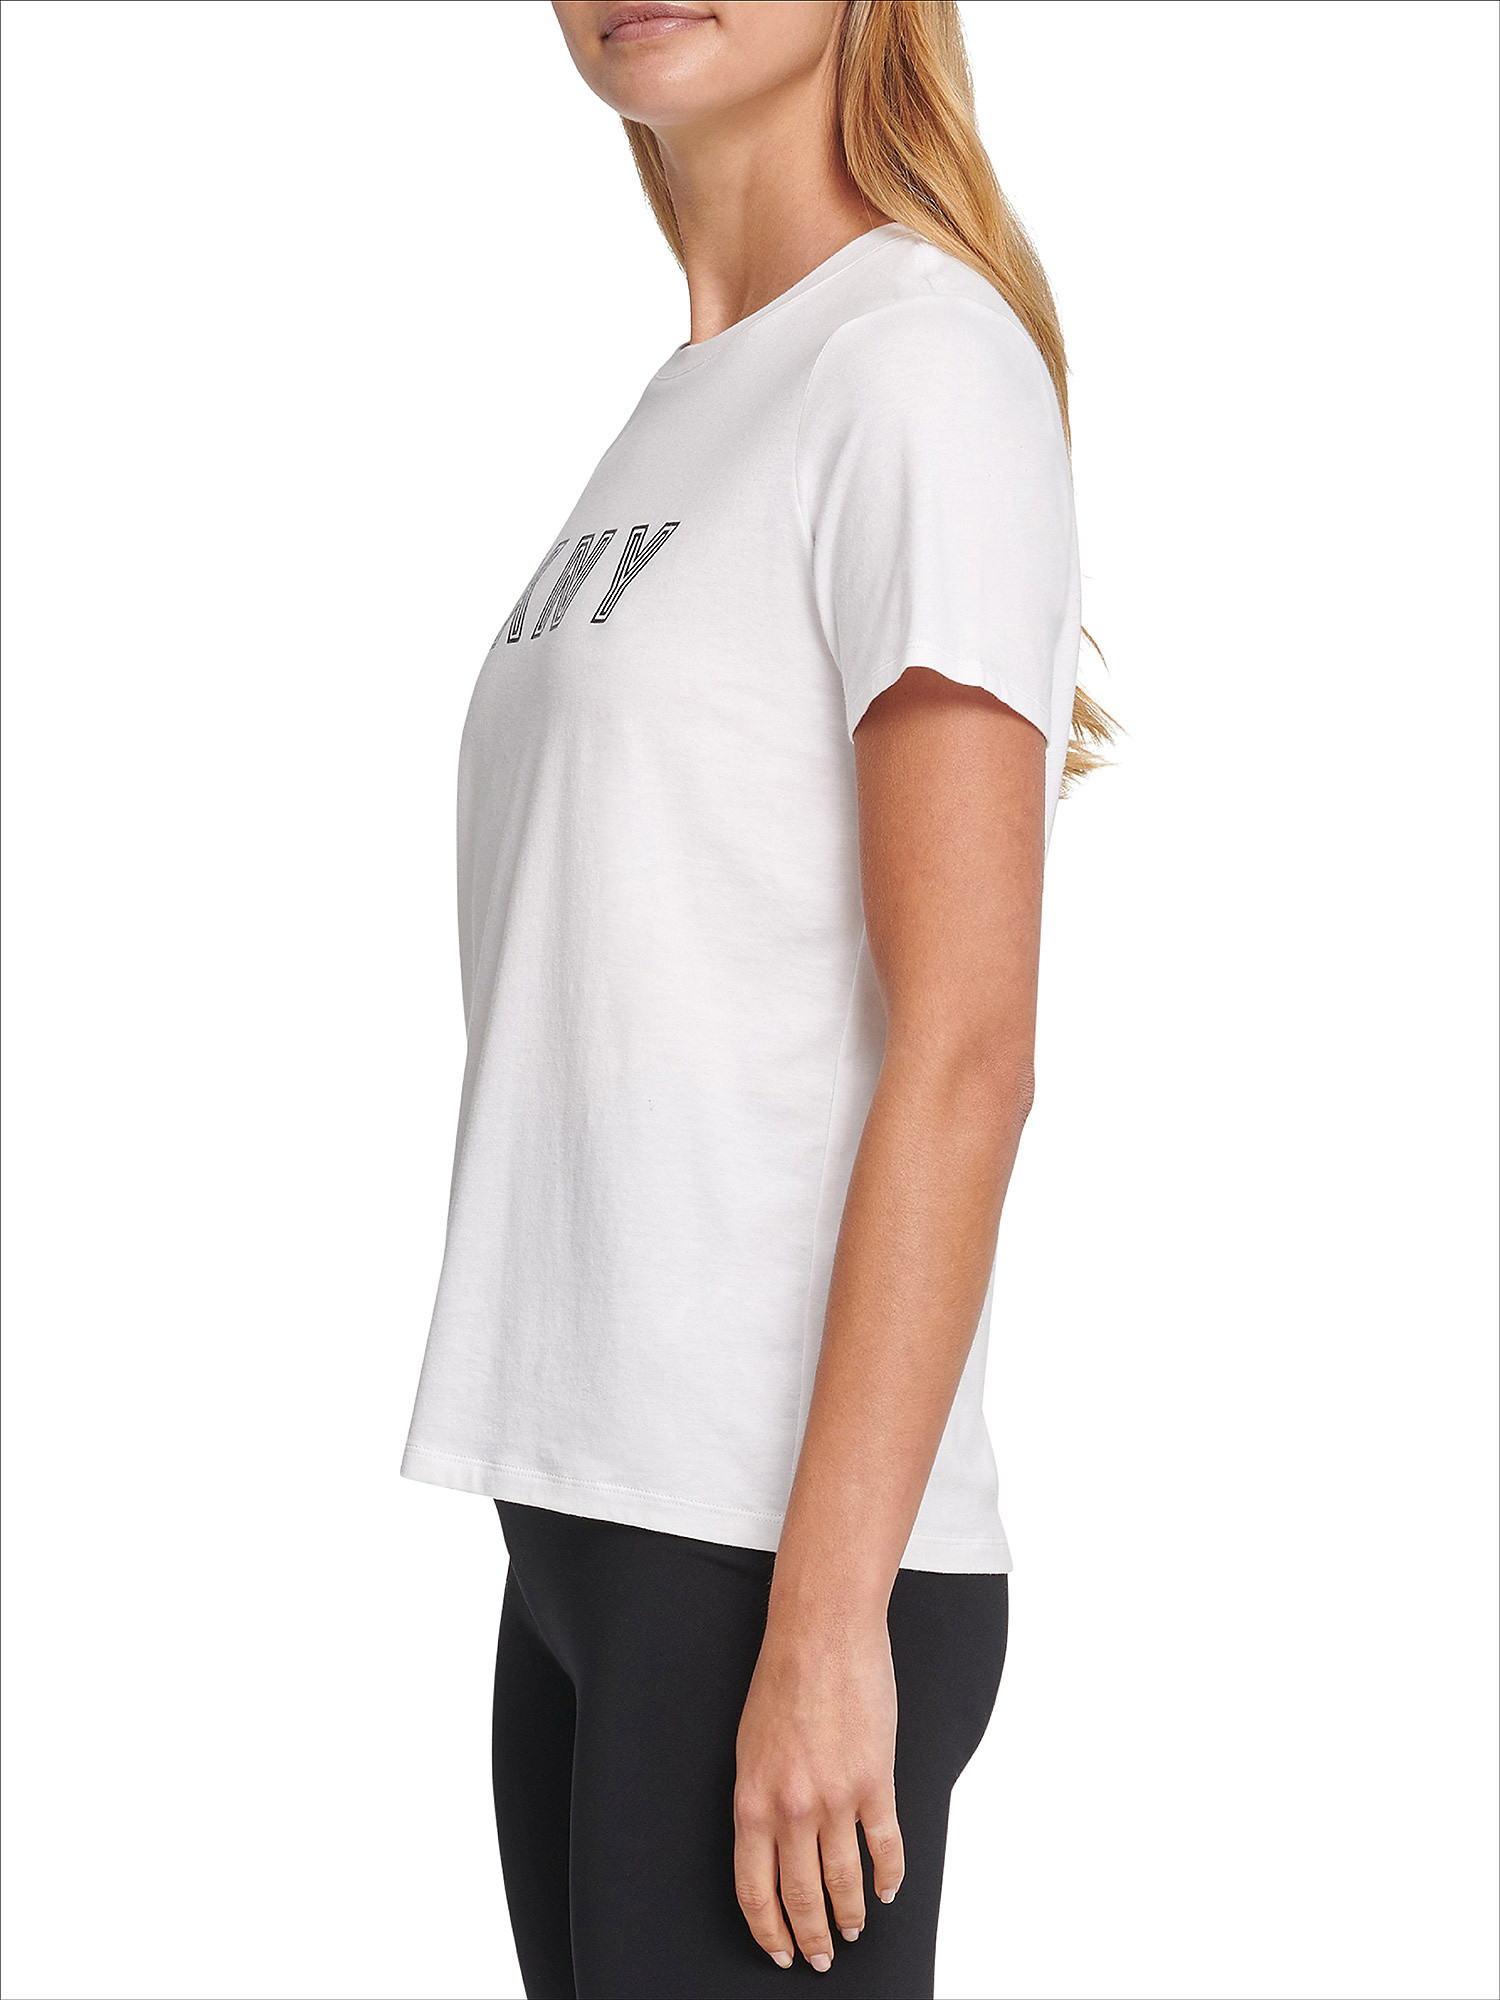 T-shirt track logo a maniche corte, Bianco, large image number 3